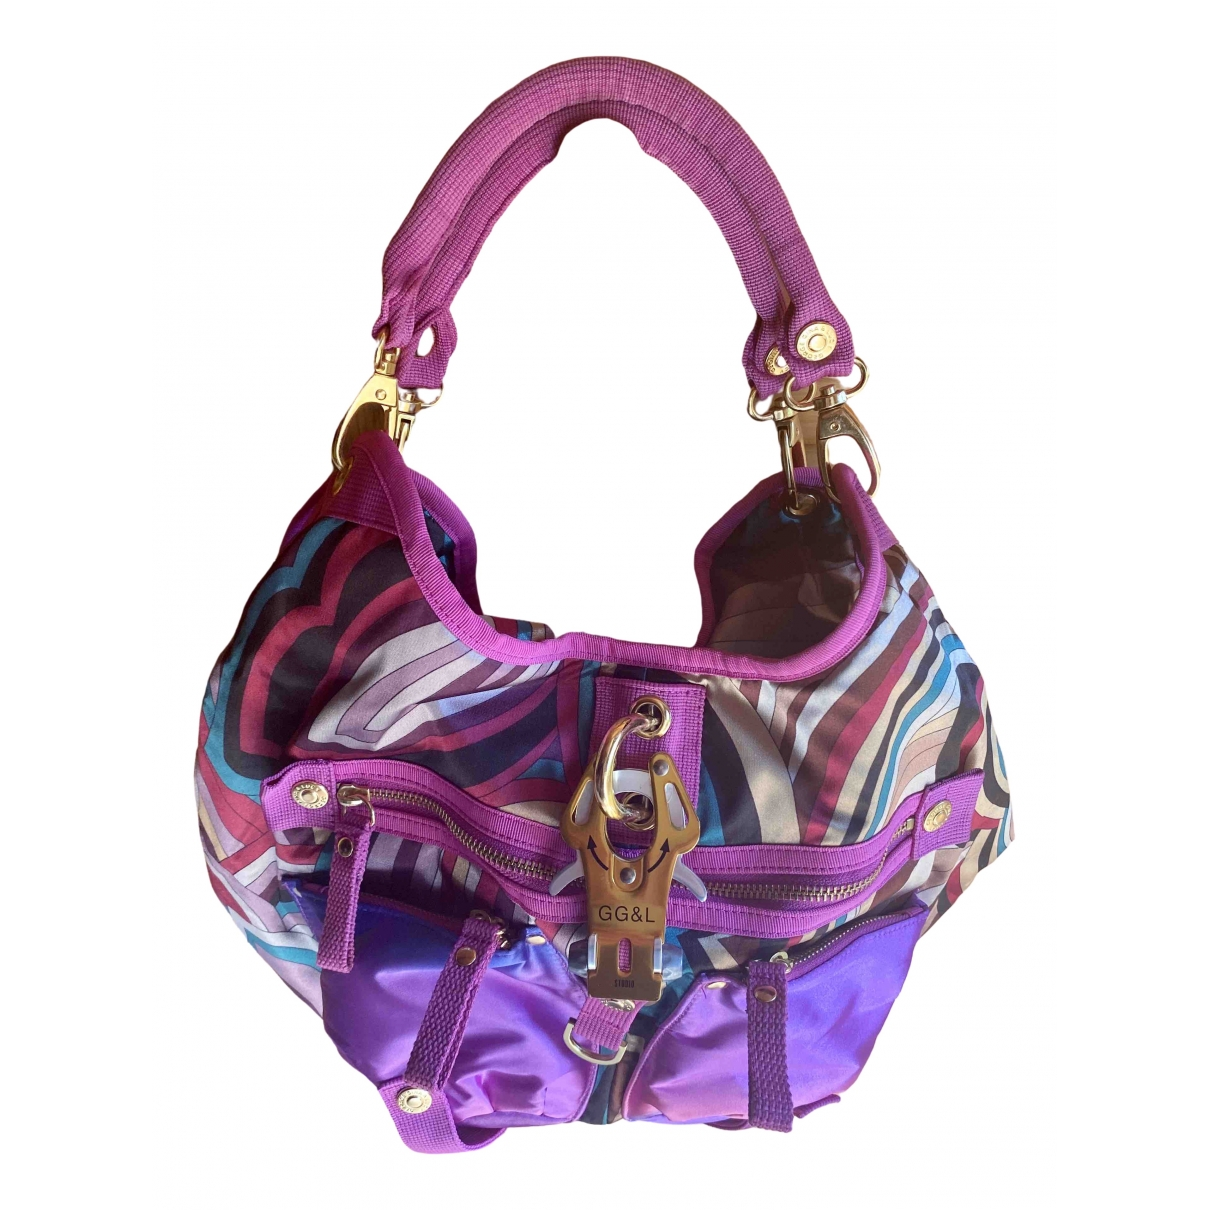 Georges \N Multicolour handbag for Women \N